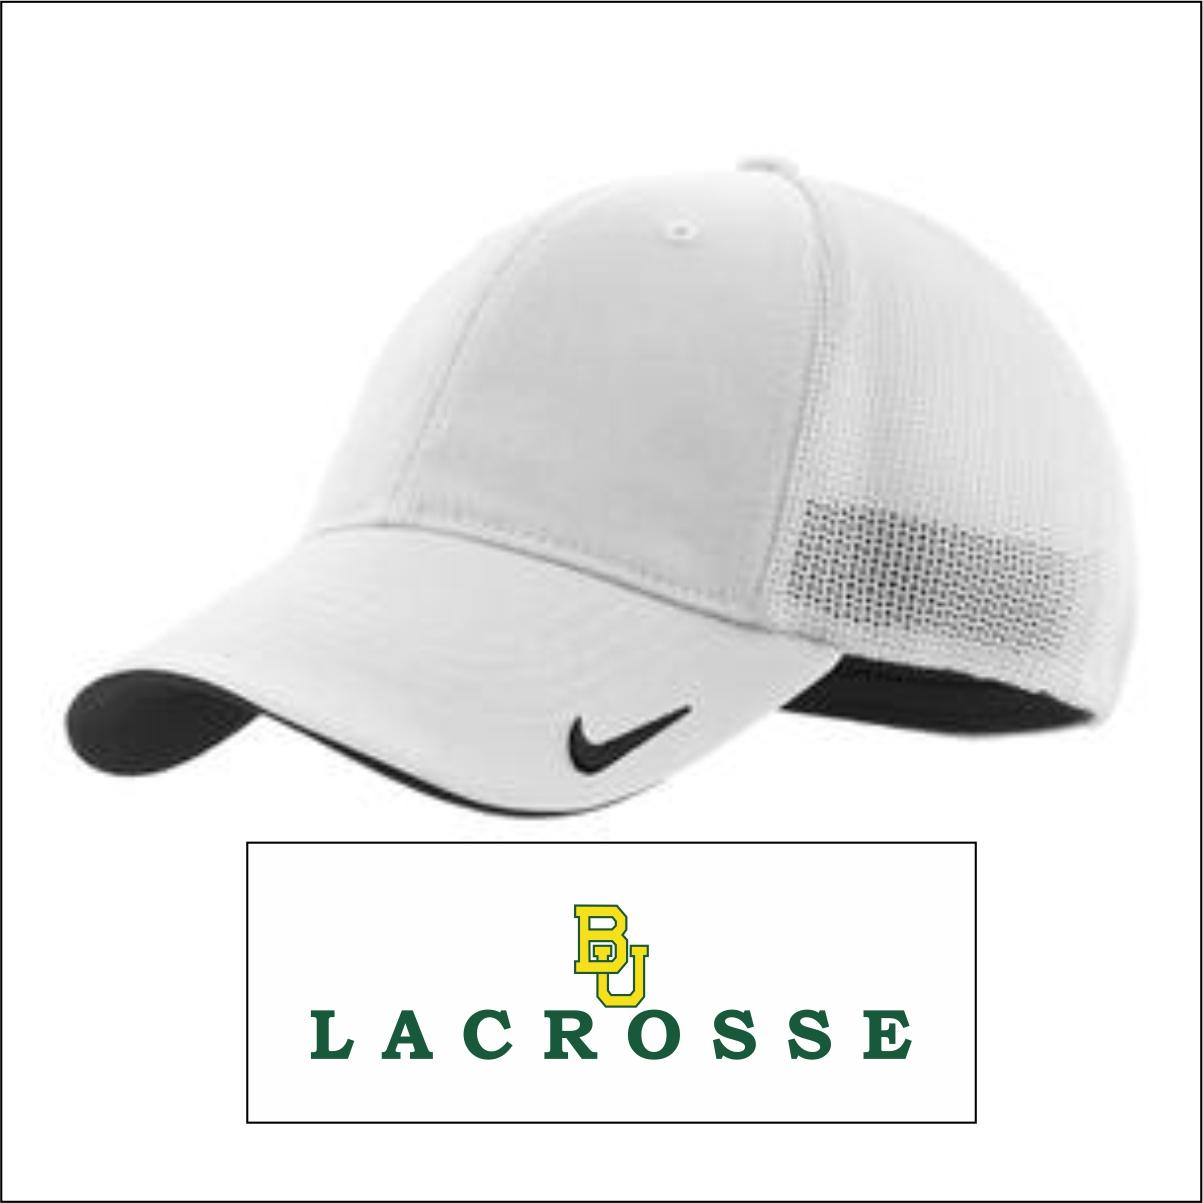 f224b913f20 Baylor Lacrosse Nike Golf - Mesh Back Cap - FlipDog Sportswear